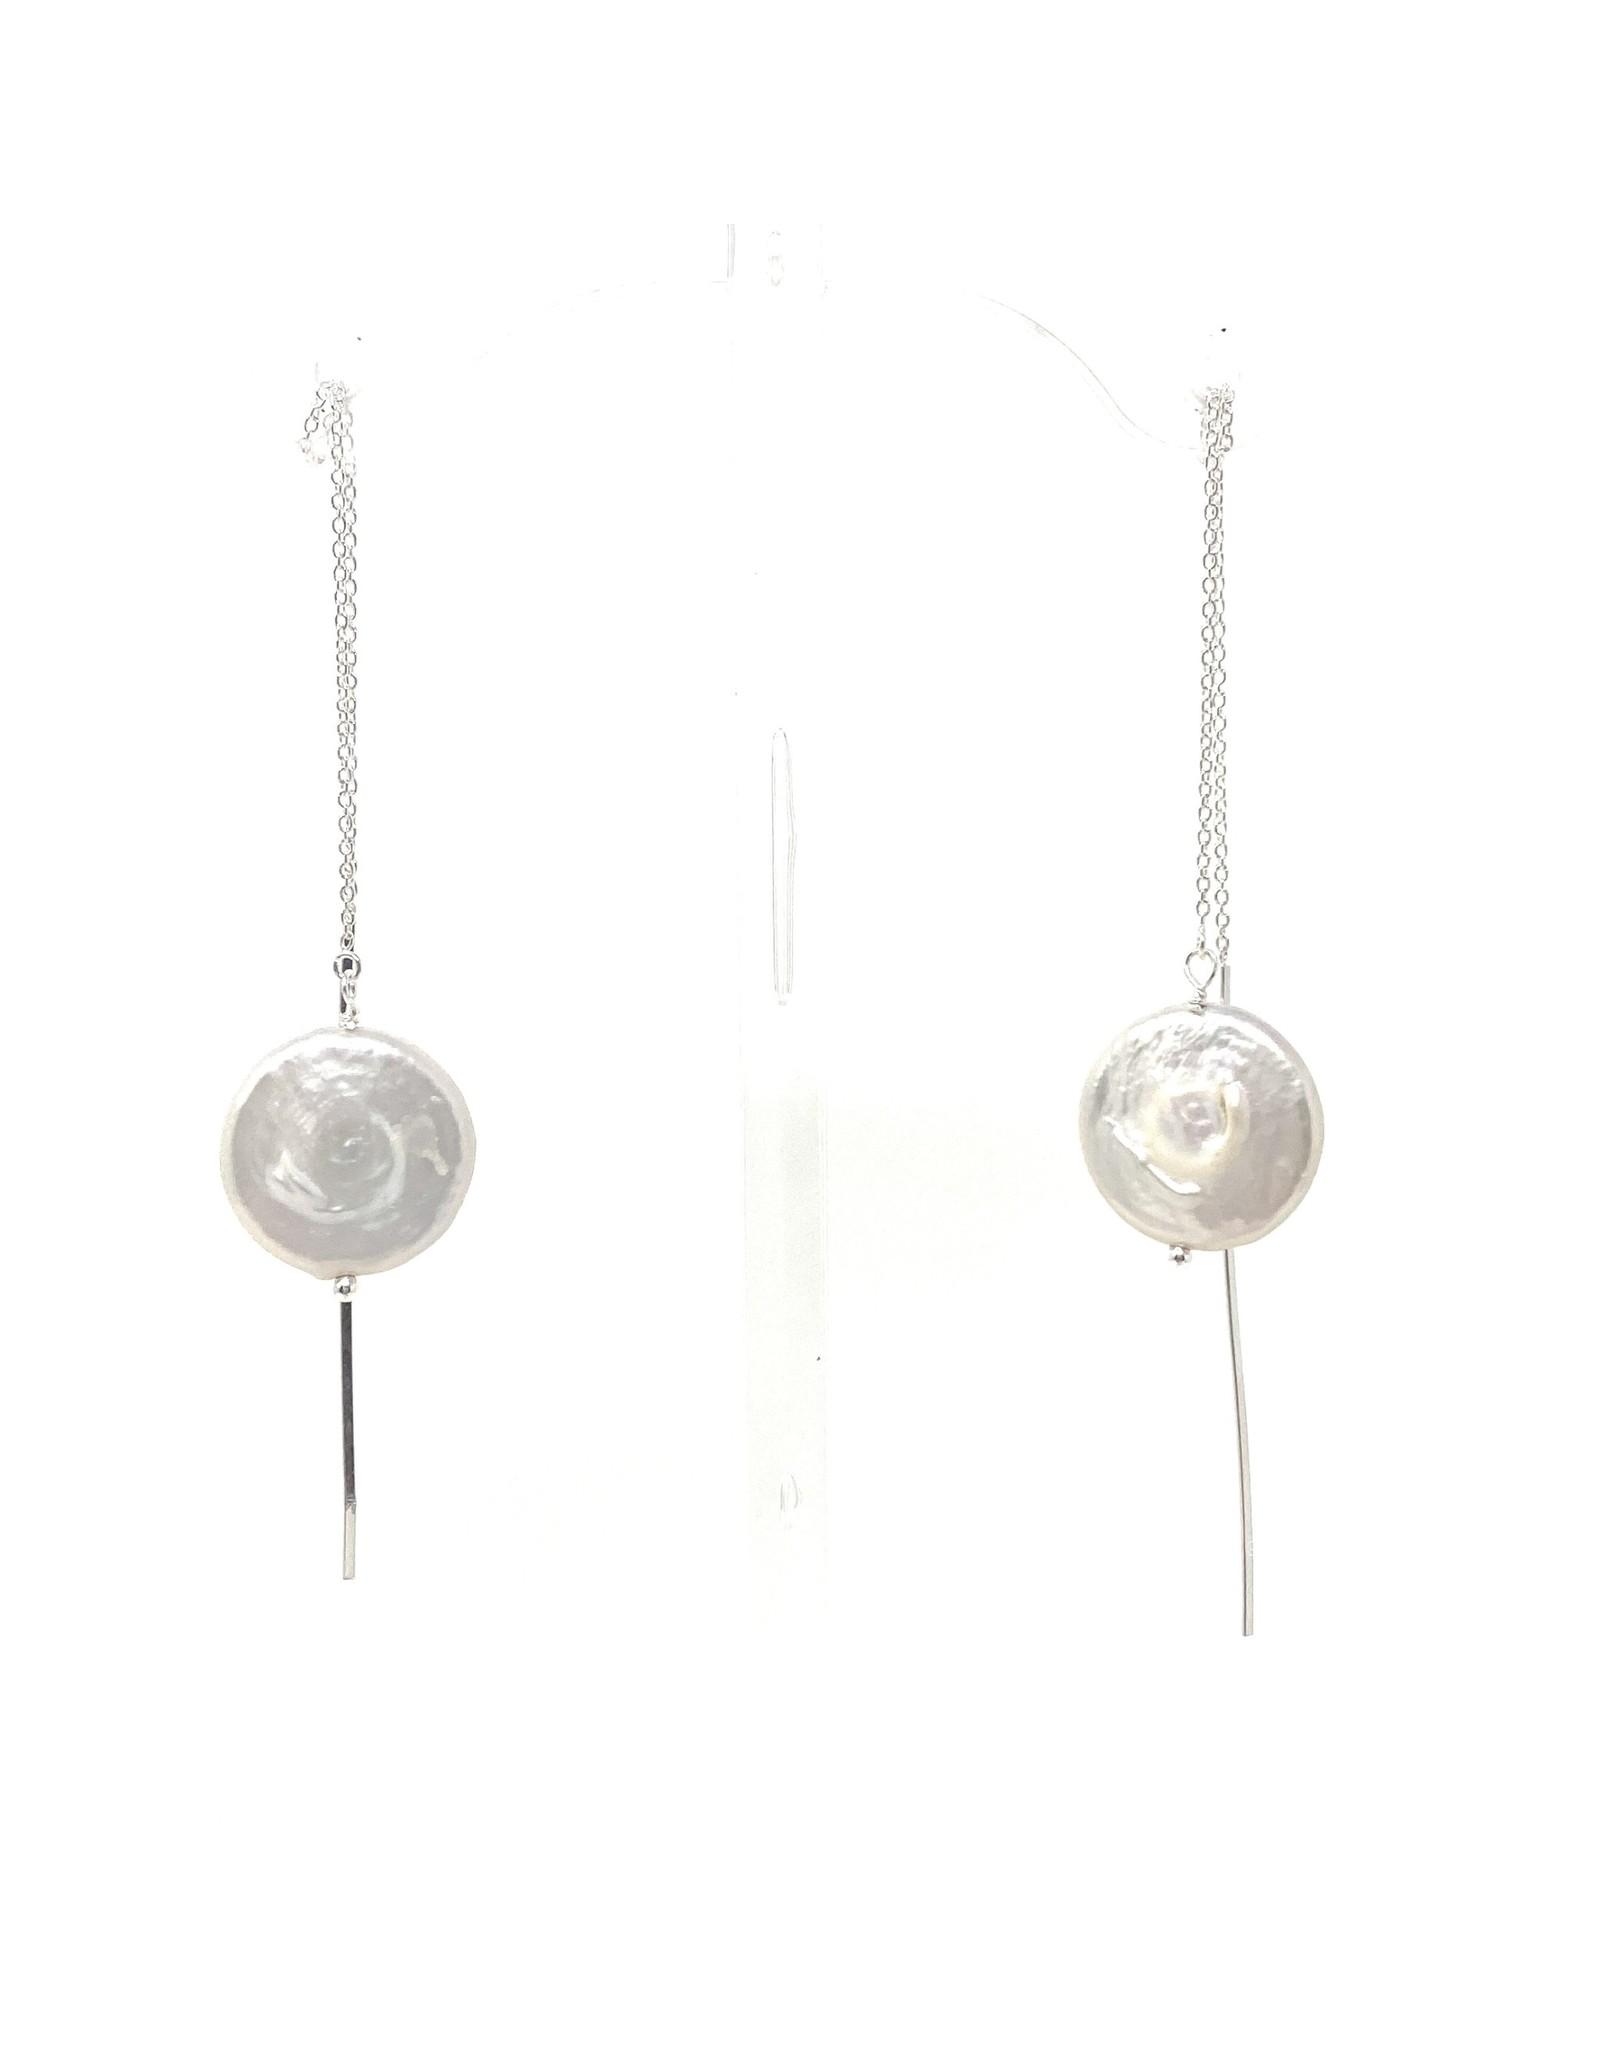 Lustre Coin Pearl Threader Earrings